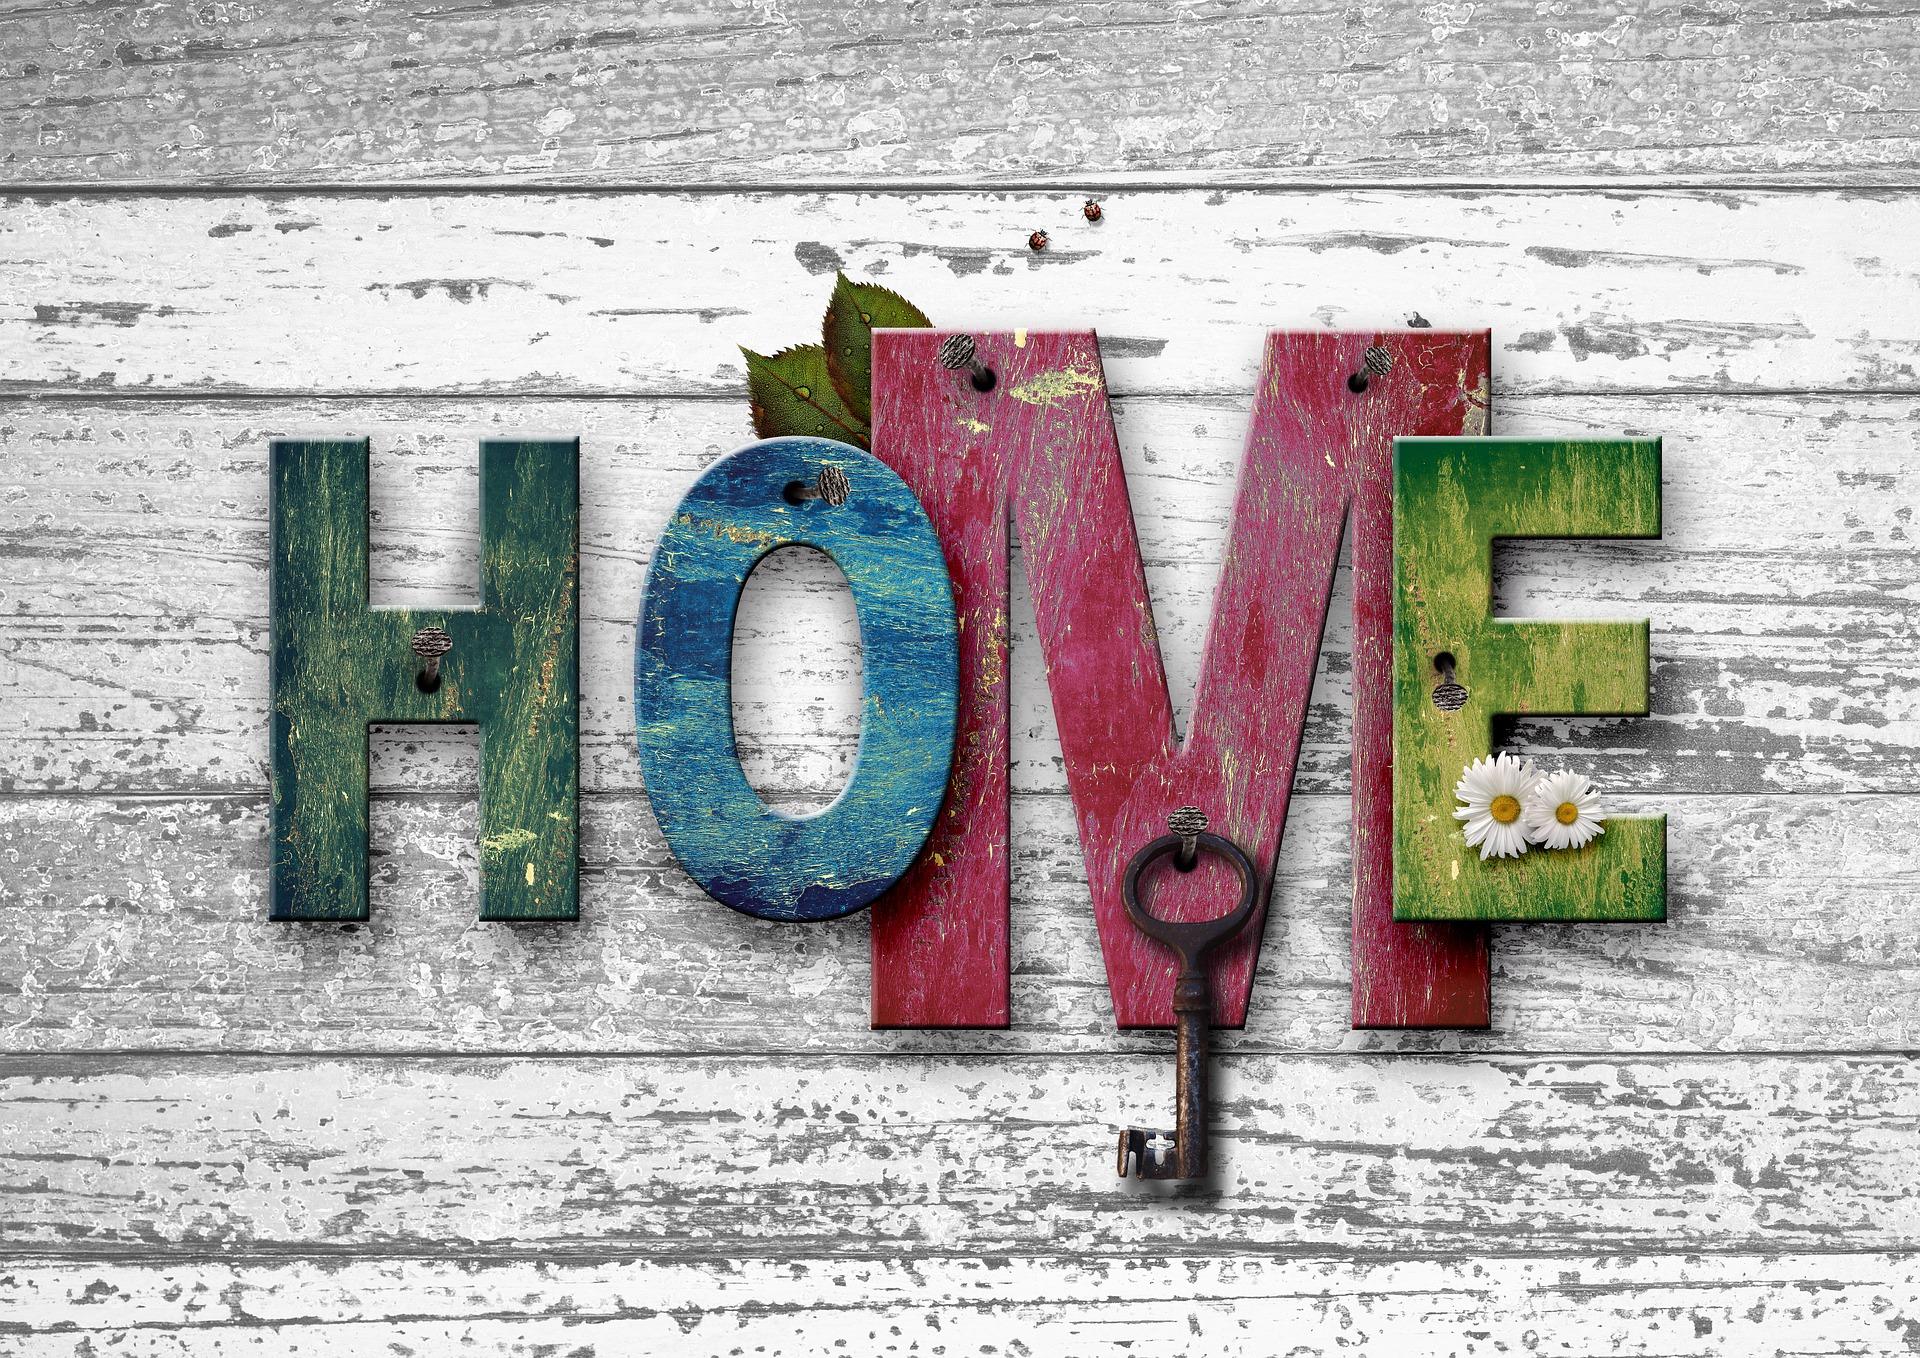 home-2406416_1920